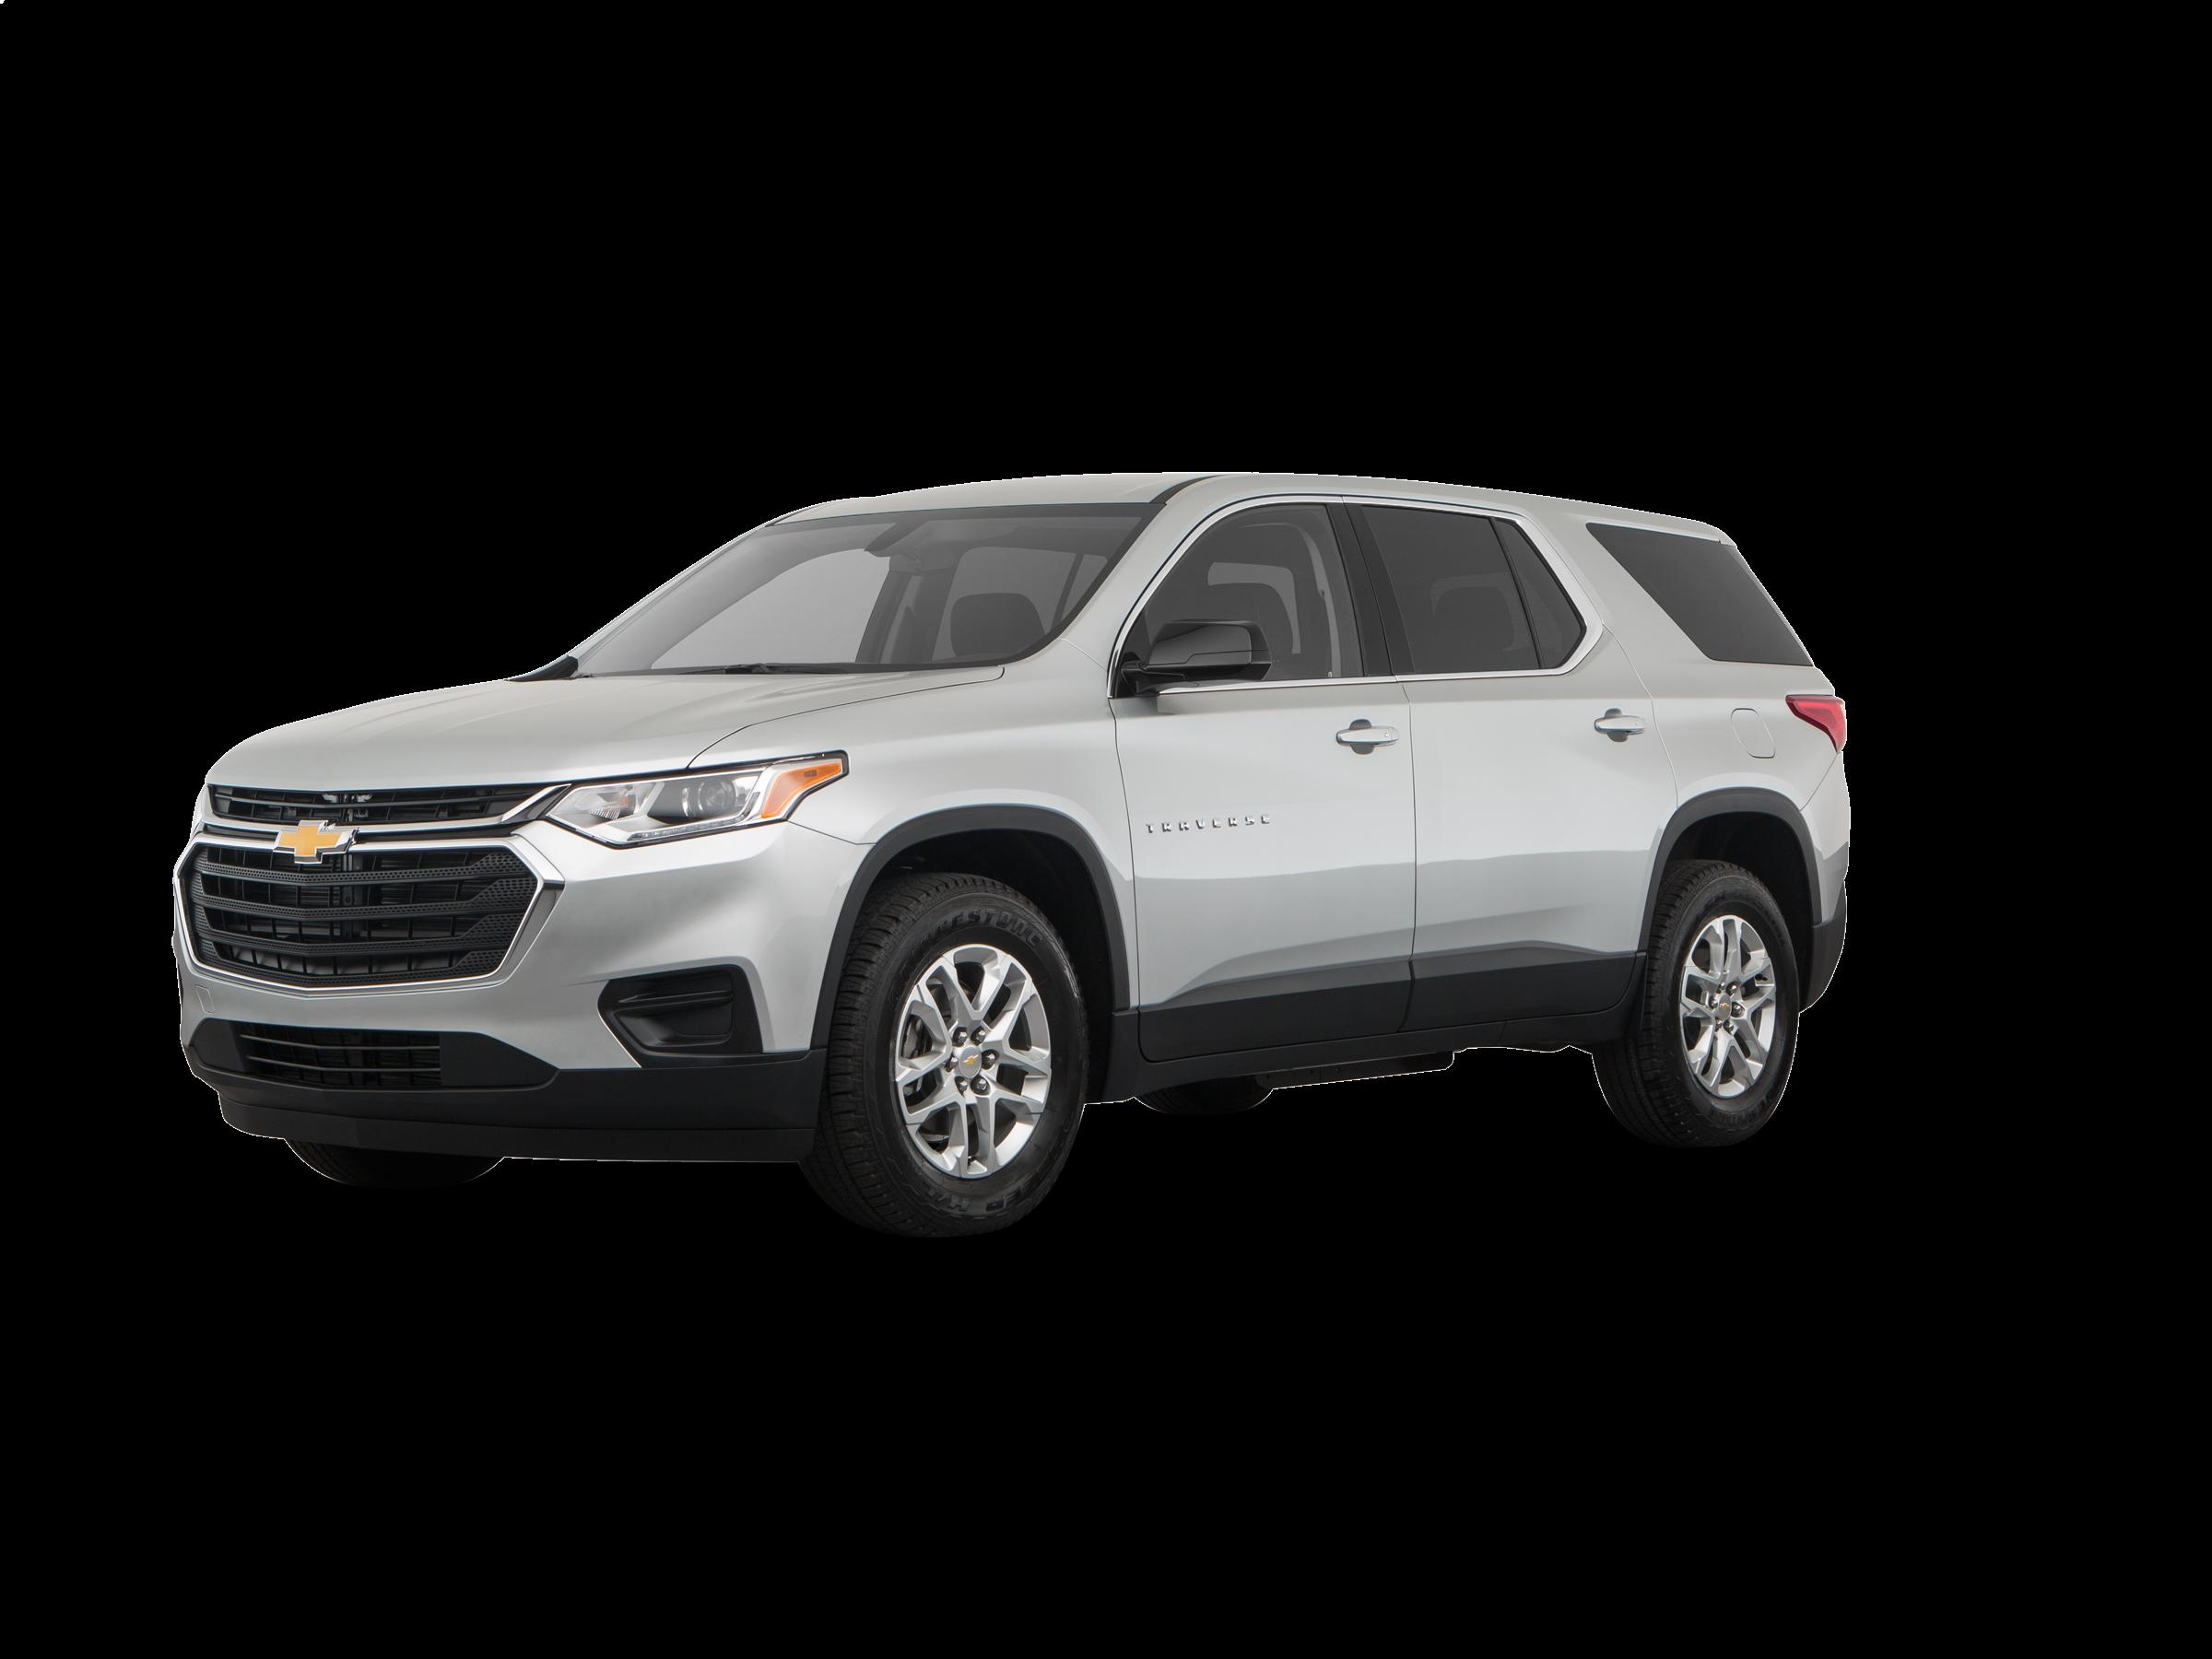 2021 Chevrolet Traverse Reviews Pricing Specs Kelley Blue Book